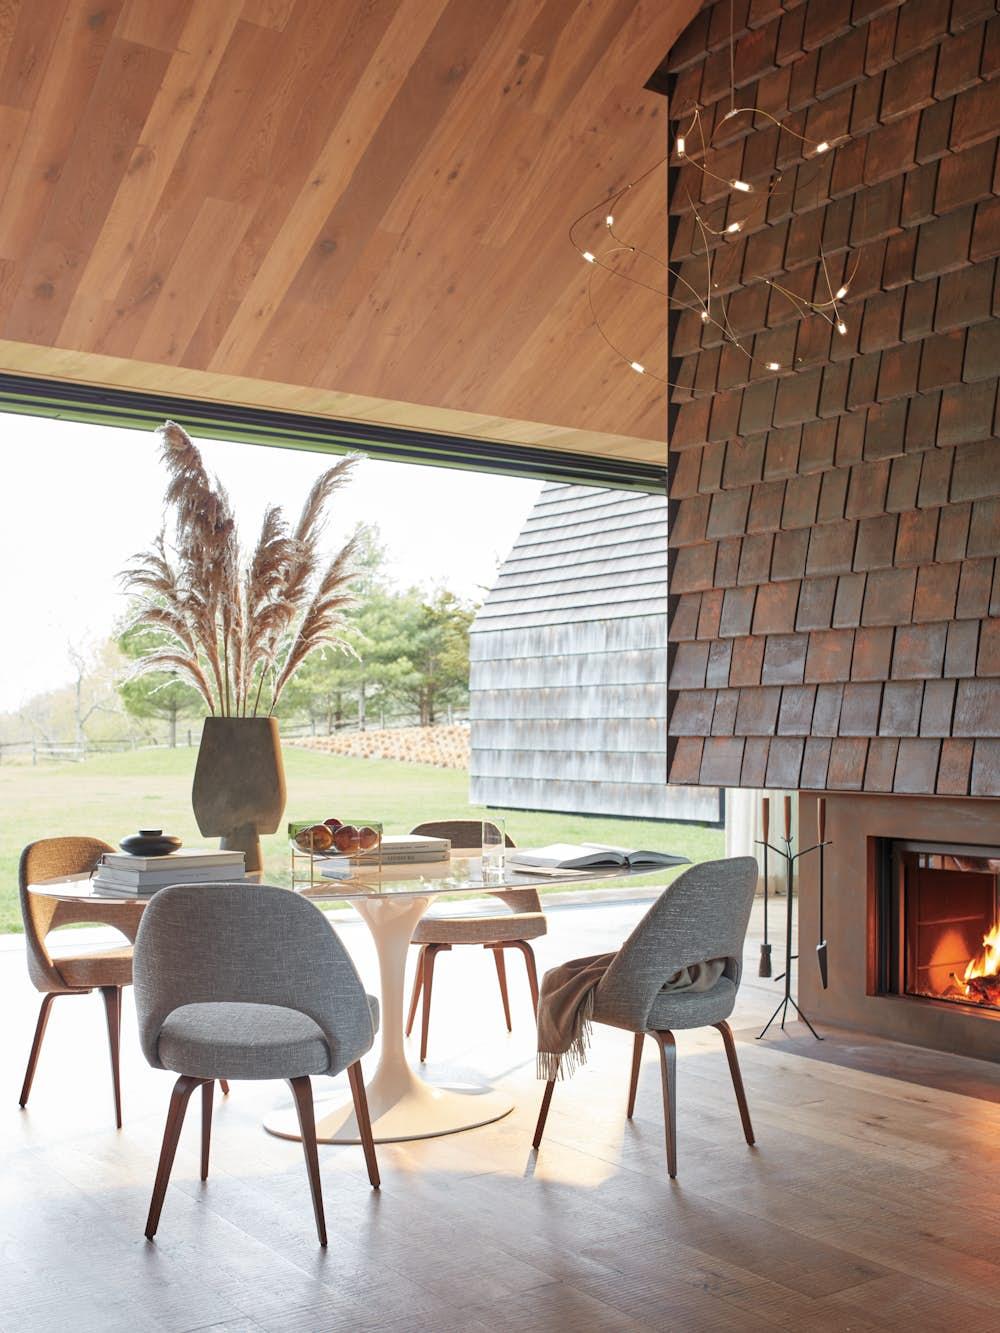 Saarinen Oval Dining with Saarinen Executive Chairs in outdoor/indoor dining room with pendant dimmed